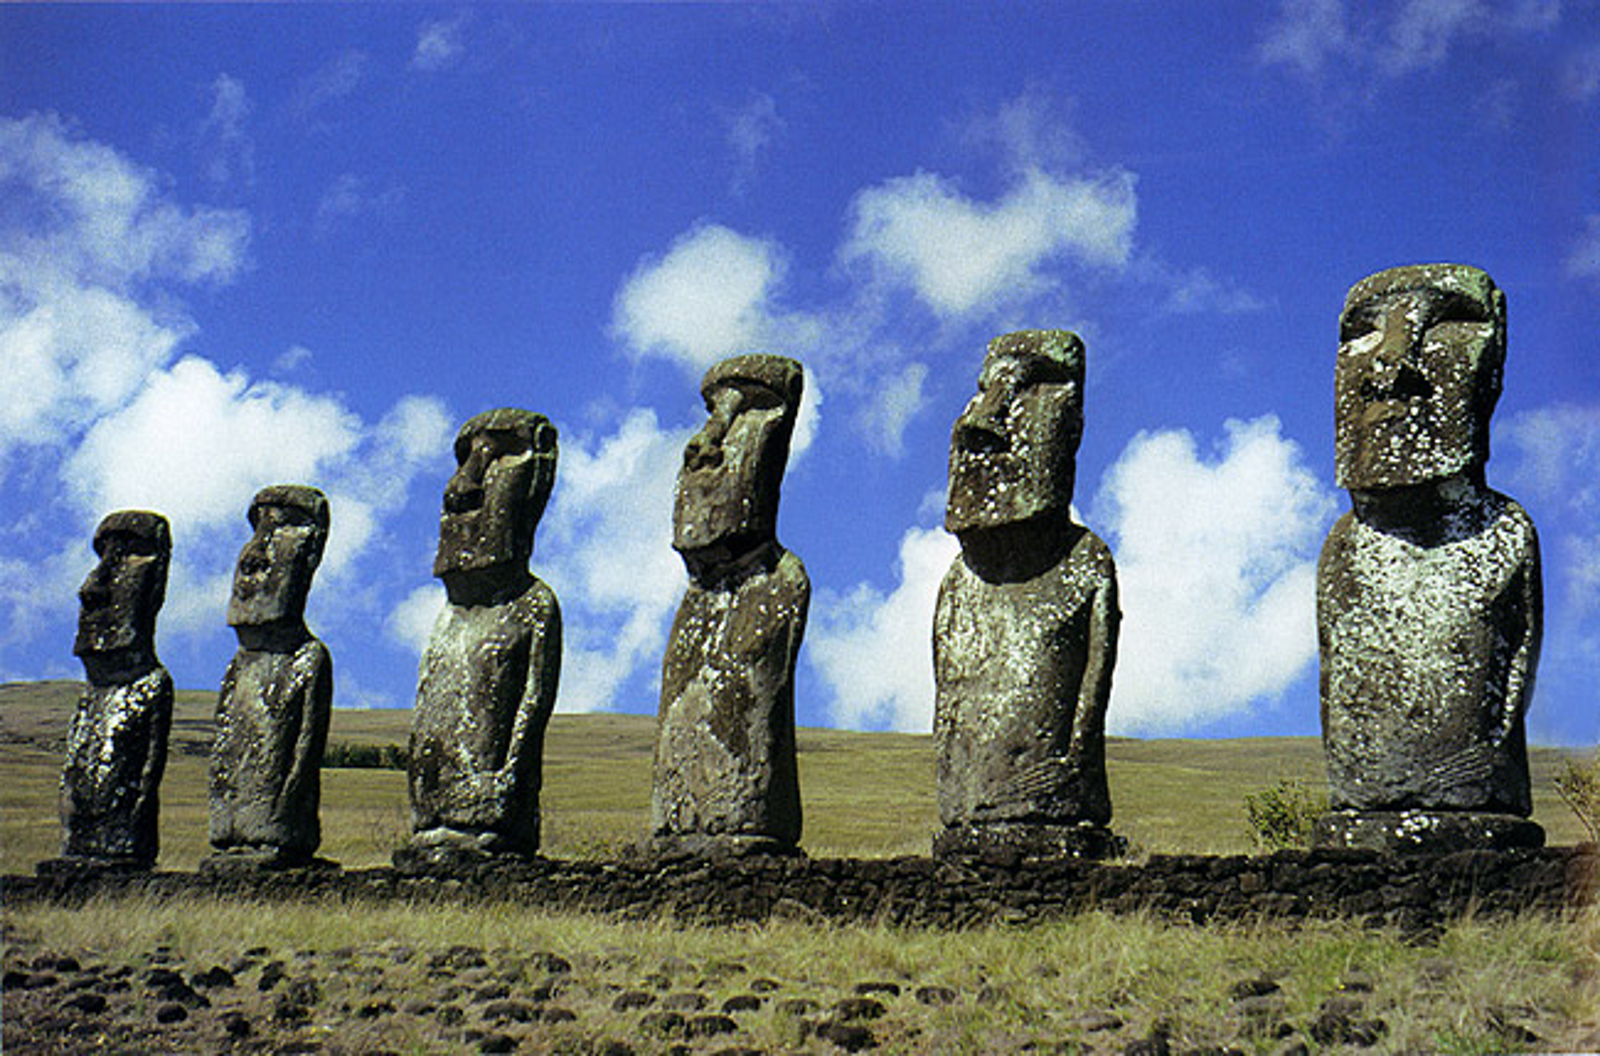 Easter Island - Moai Statues and Rock Art of Rapa Nui